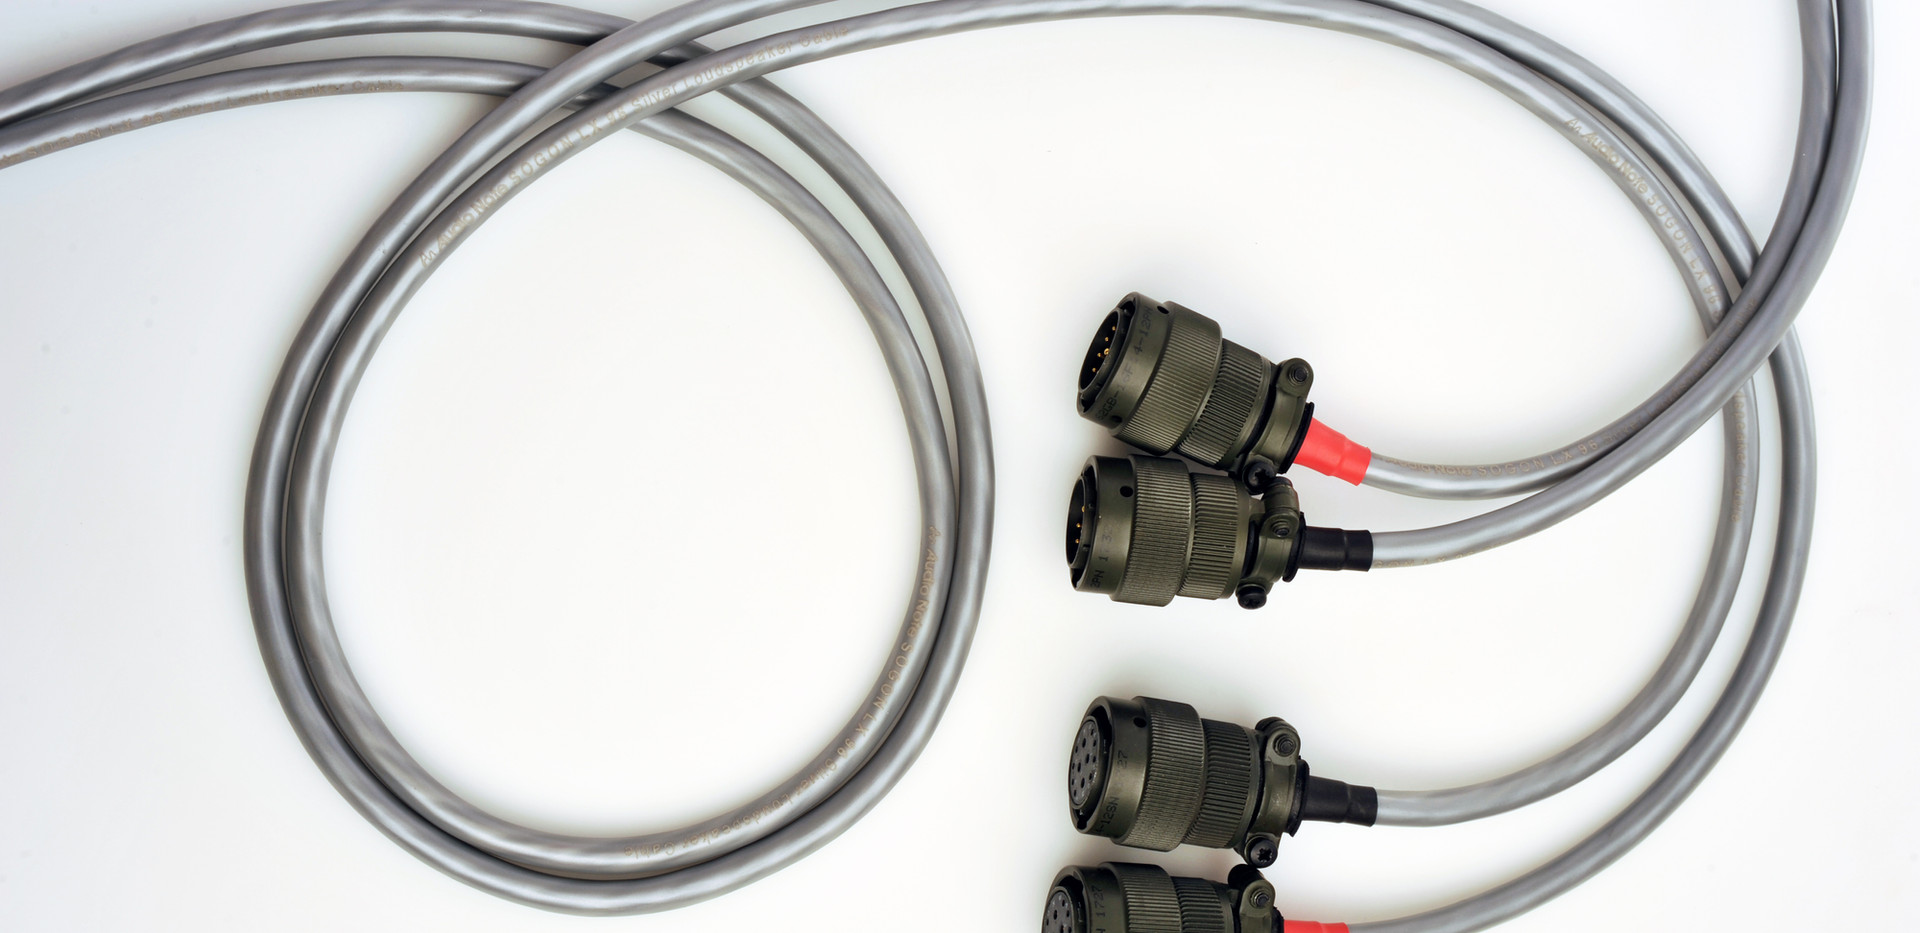 M9 RIAA Sig cables 1 edit 1.jpg